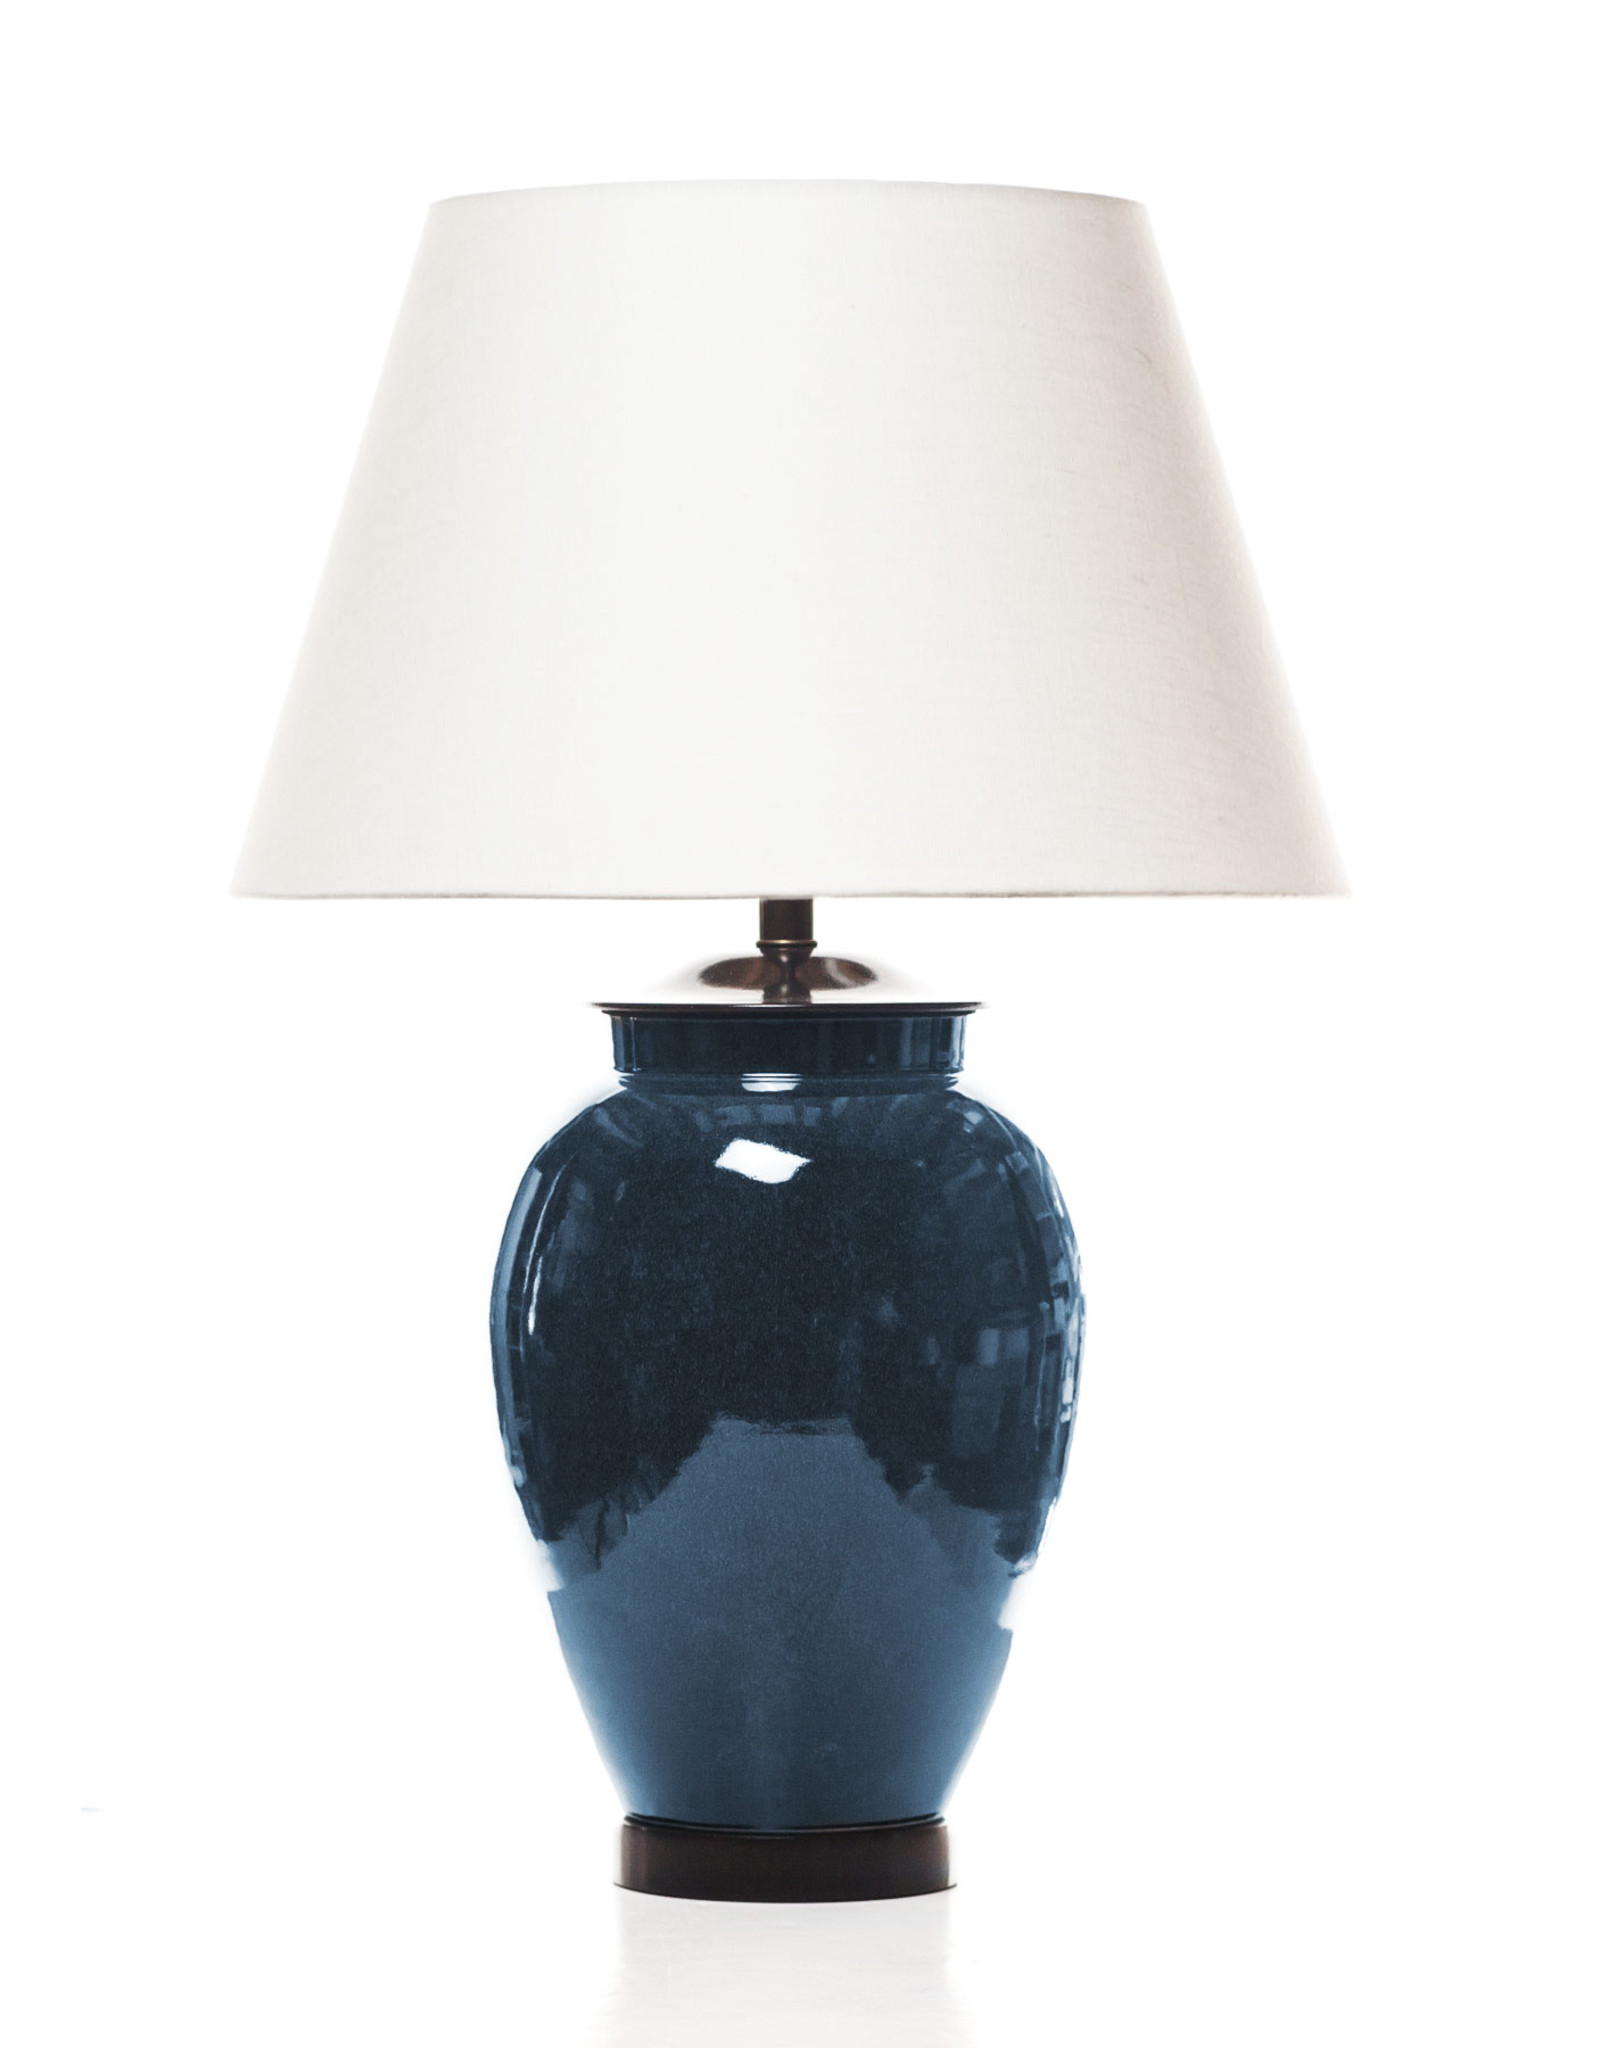 Lawrence & Scott Legacy Sybil Porcelain Ocean Glaze Table Lamp